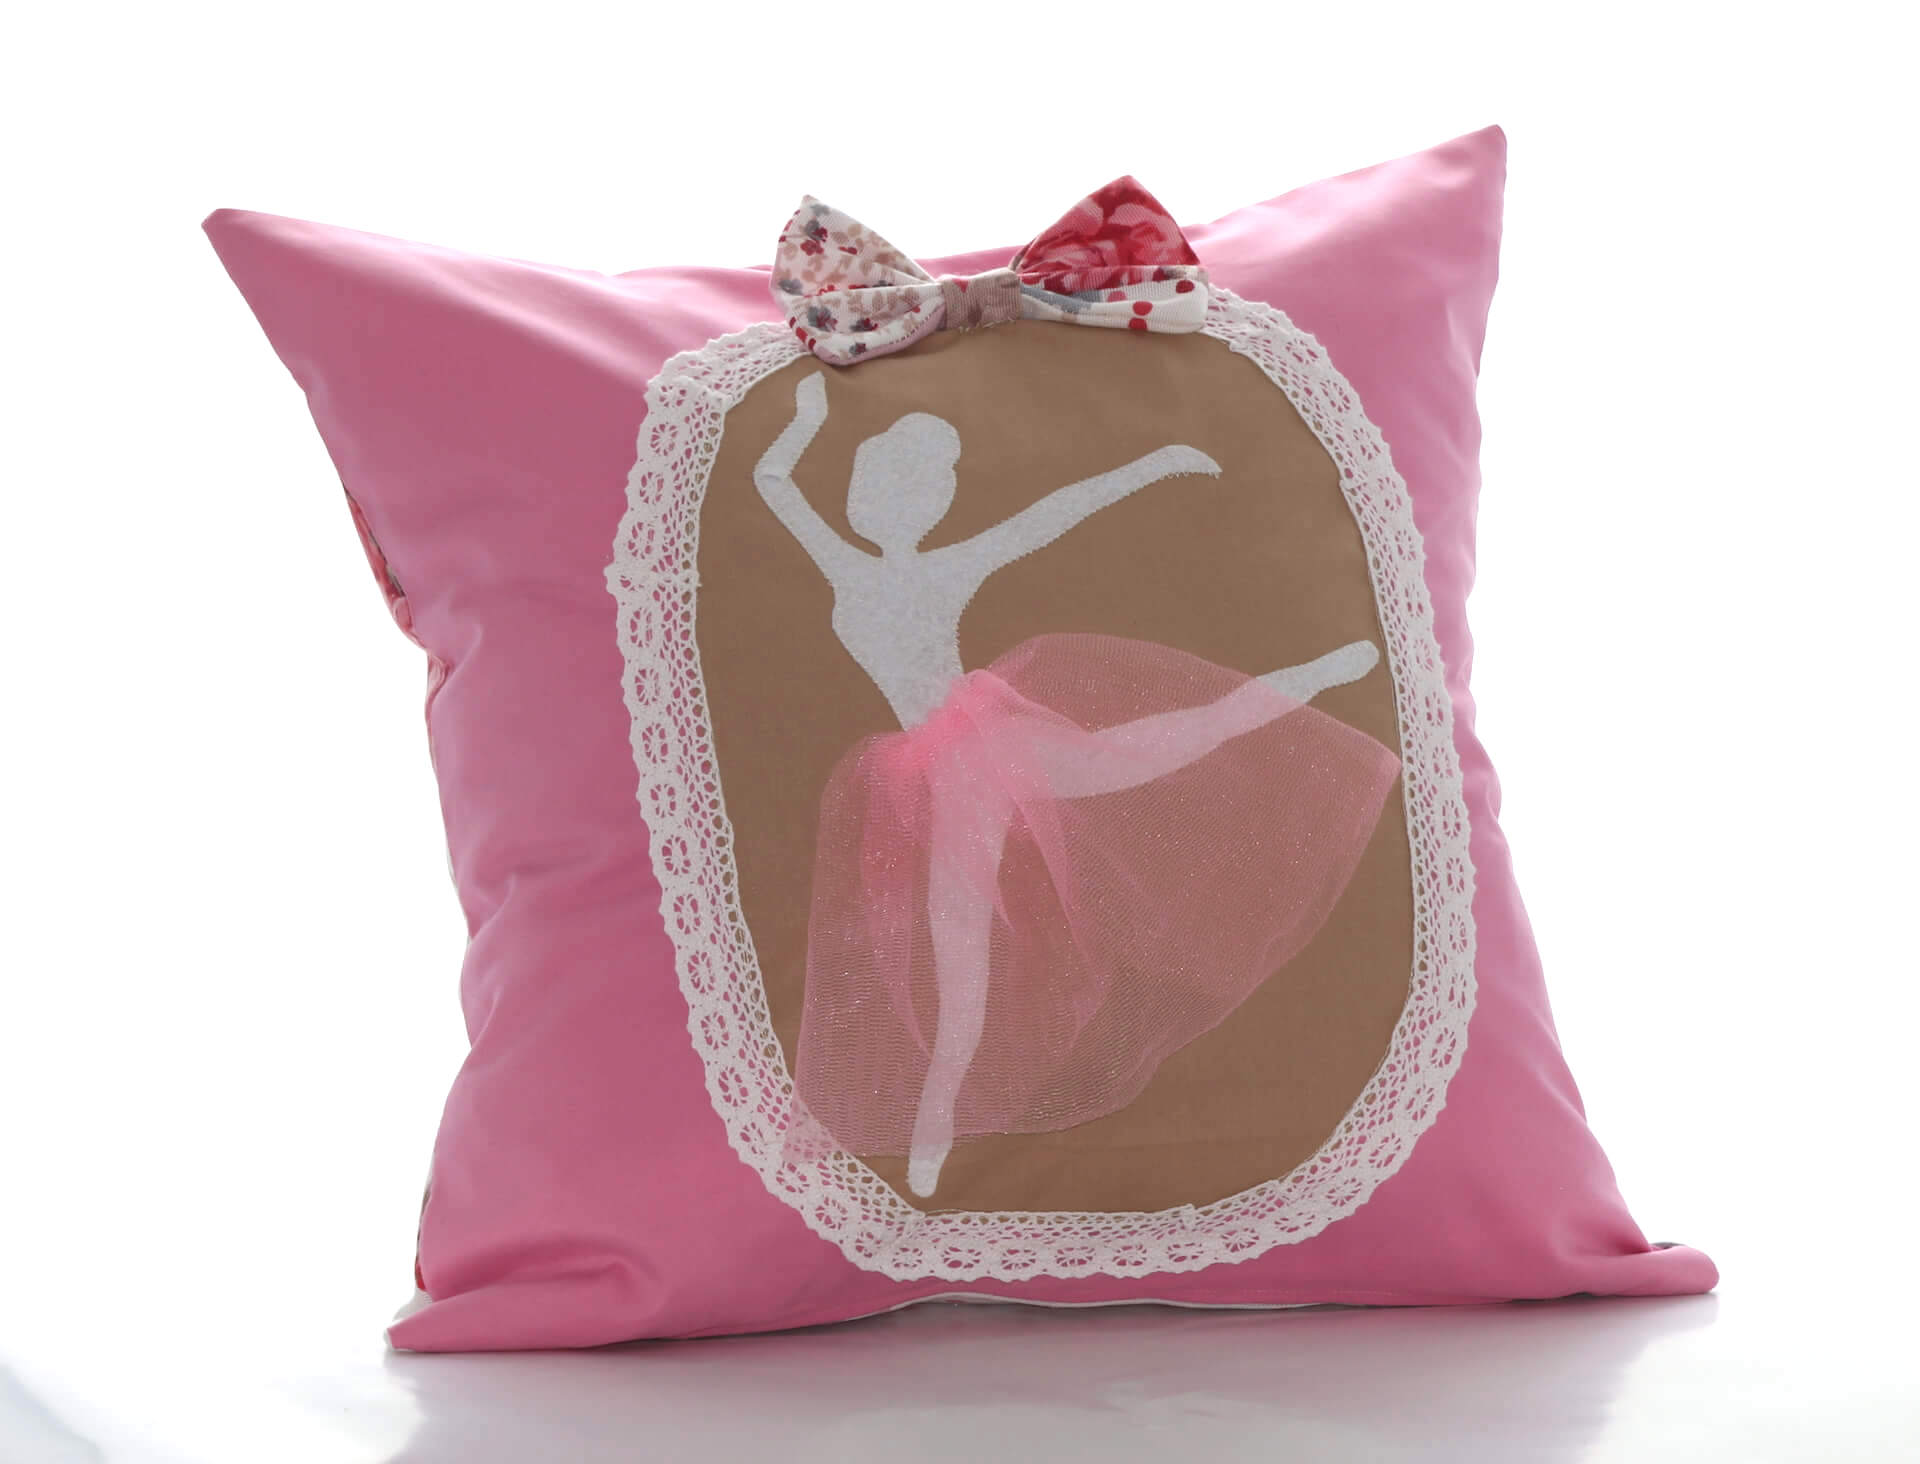 Handmade decorative pink pillow with ballerina